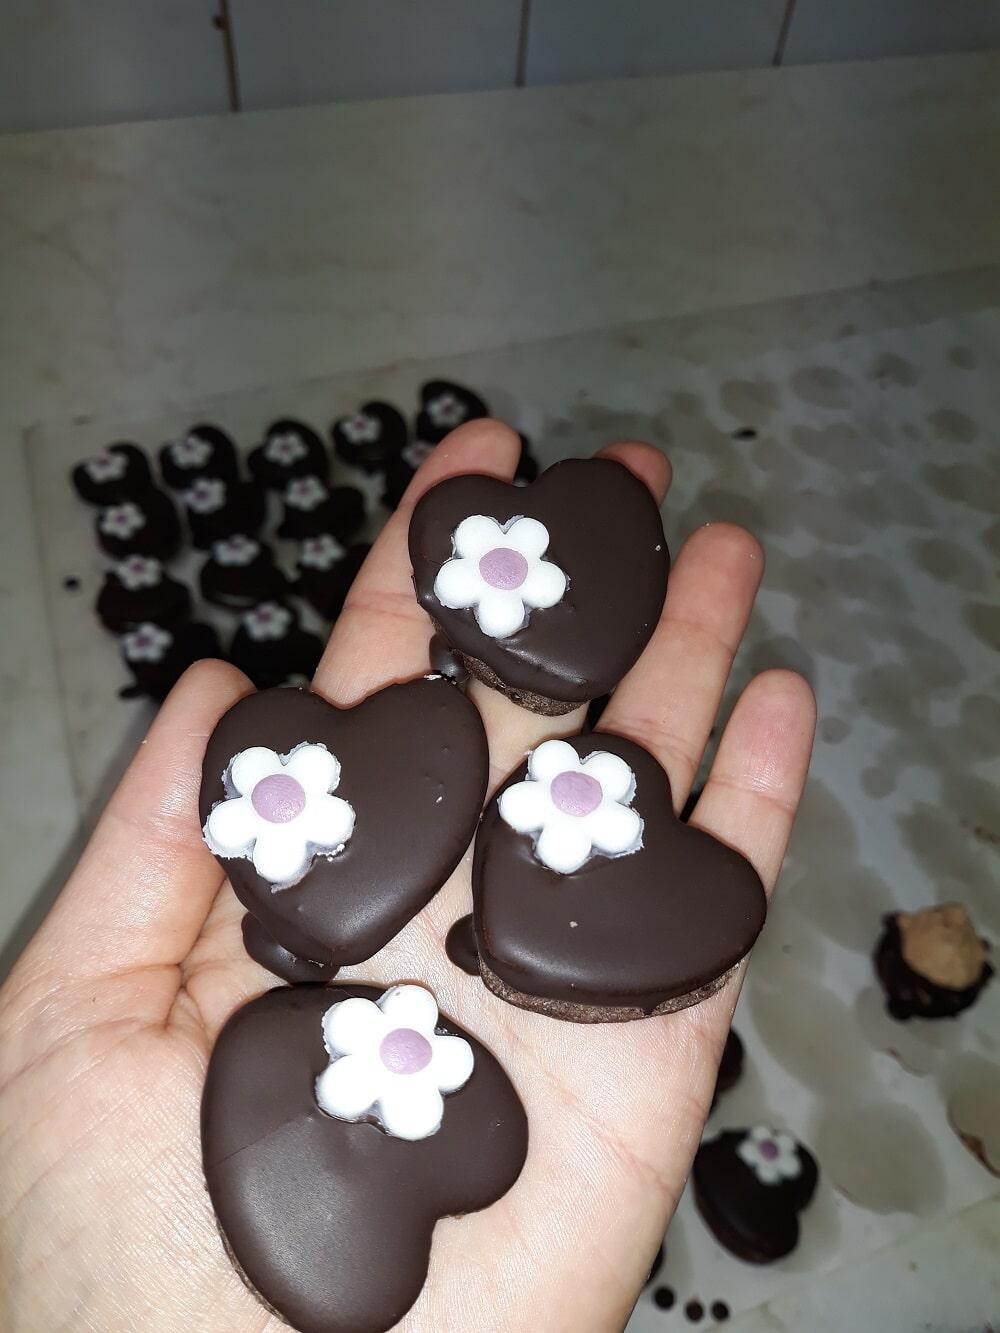 Cukrárna Vyskytná s.r.o. | Zákusky | Dorty | Cukroví | Svatby